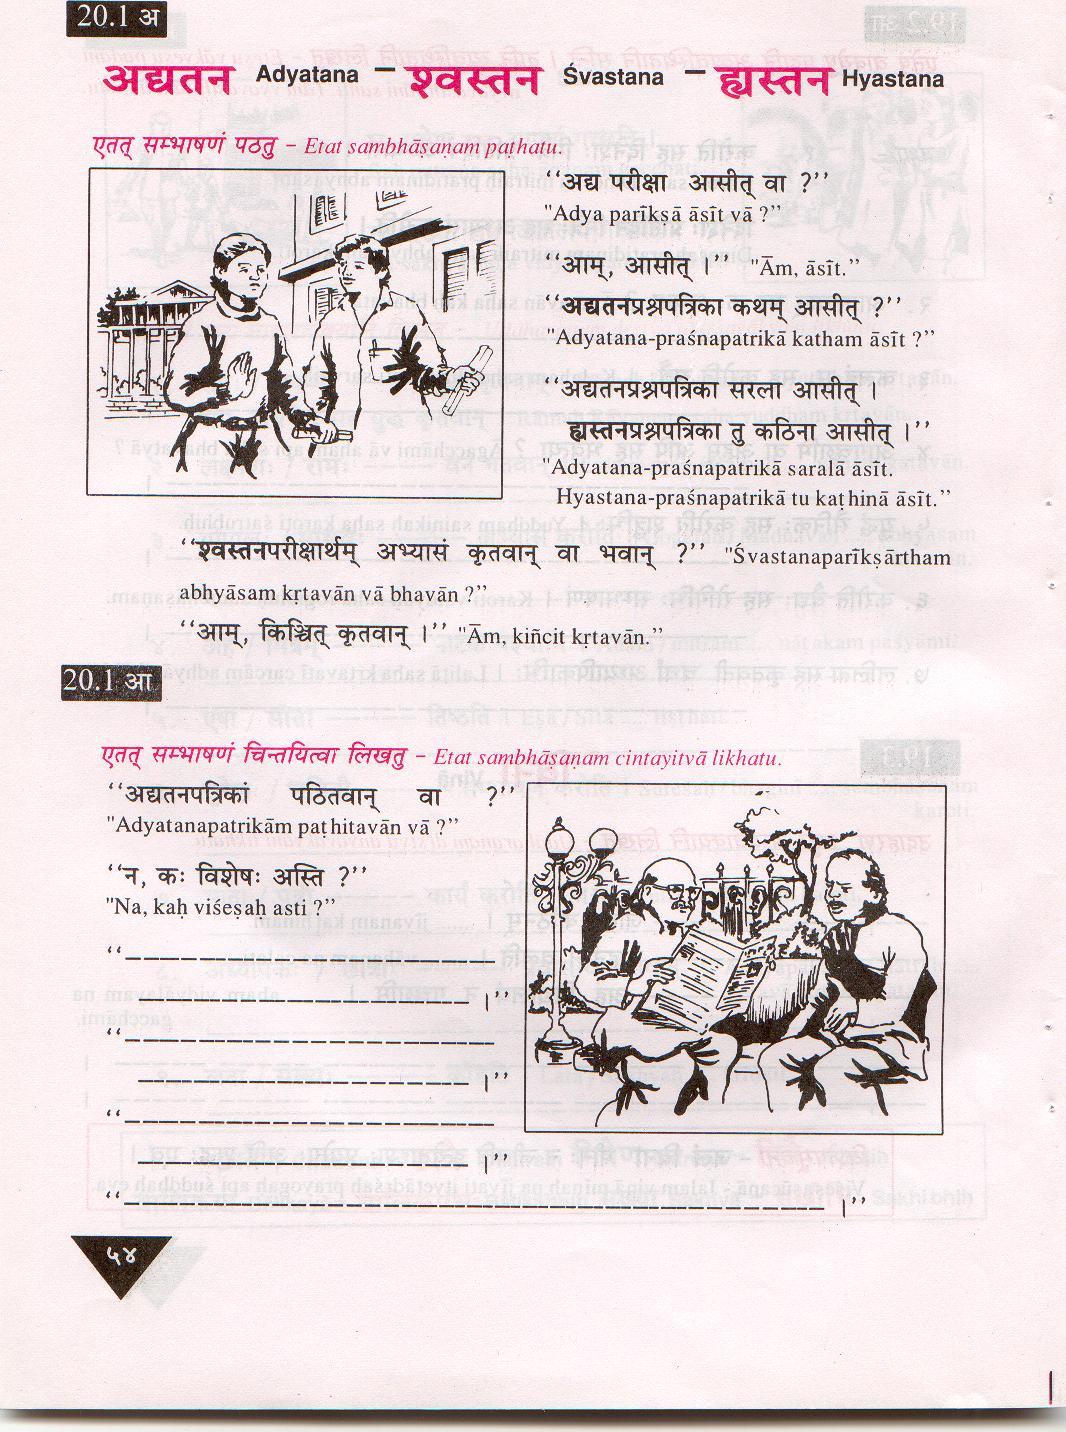 plastic essay in sanskrit Essays in sanskrit on festivals in nc research paper phd dissertations dumbed down curriculum la mort et le mourant dissertation argumentative essay about plastic.